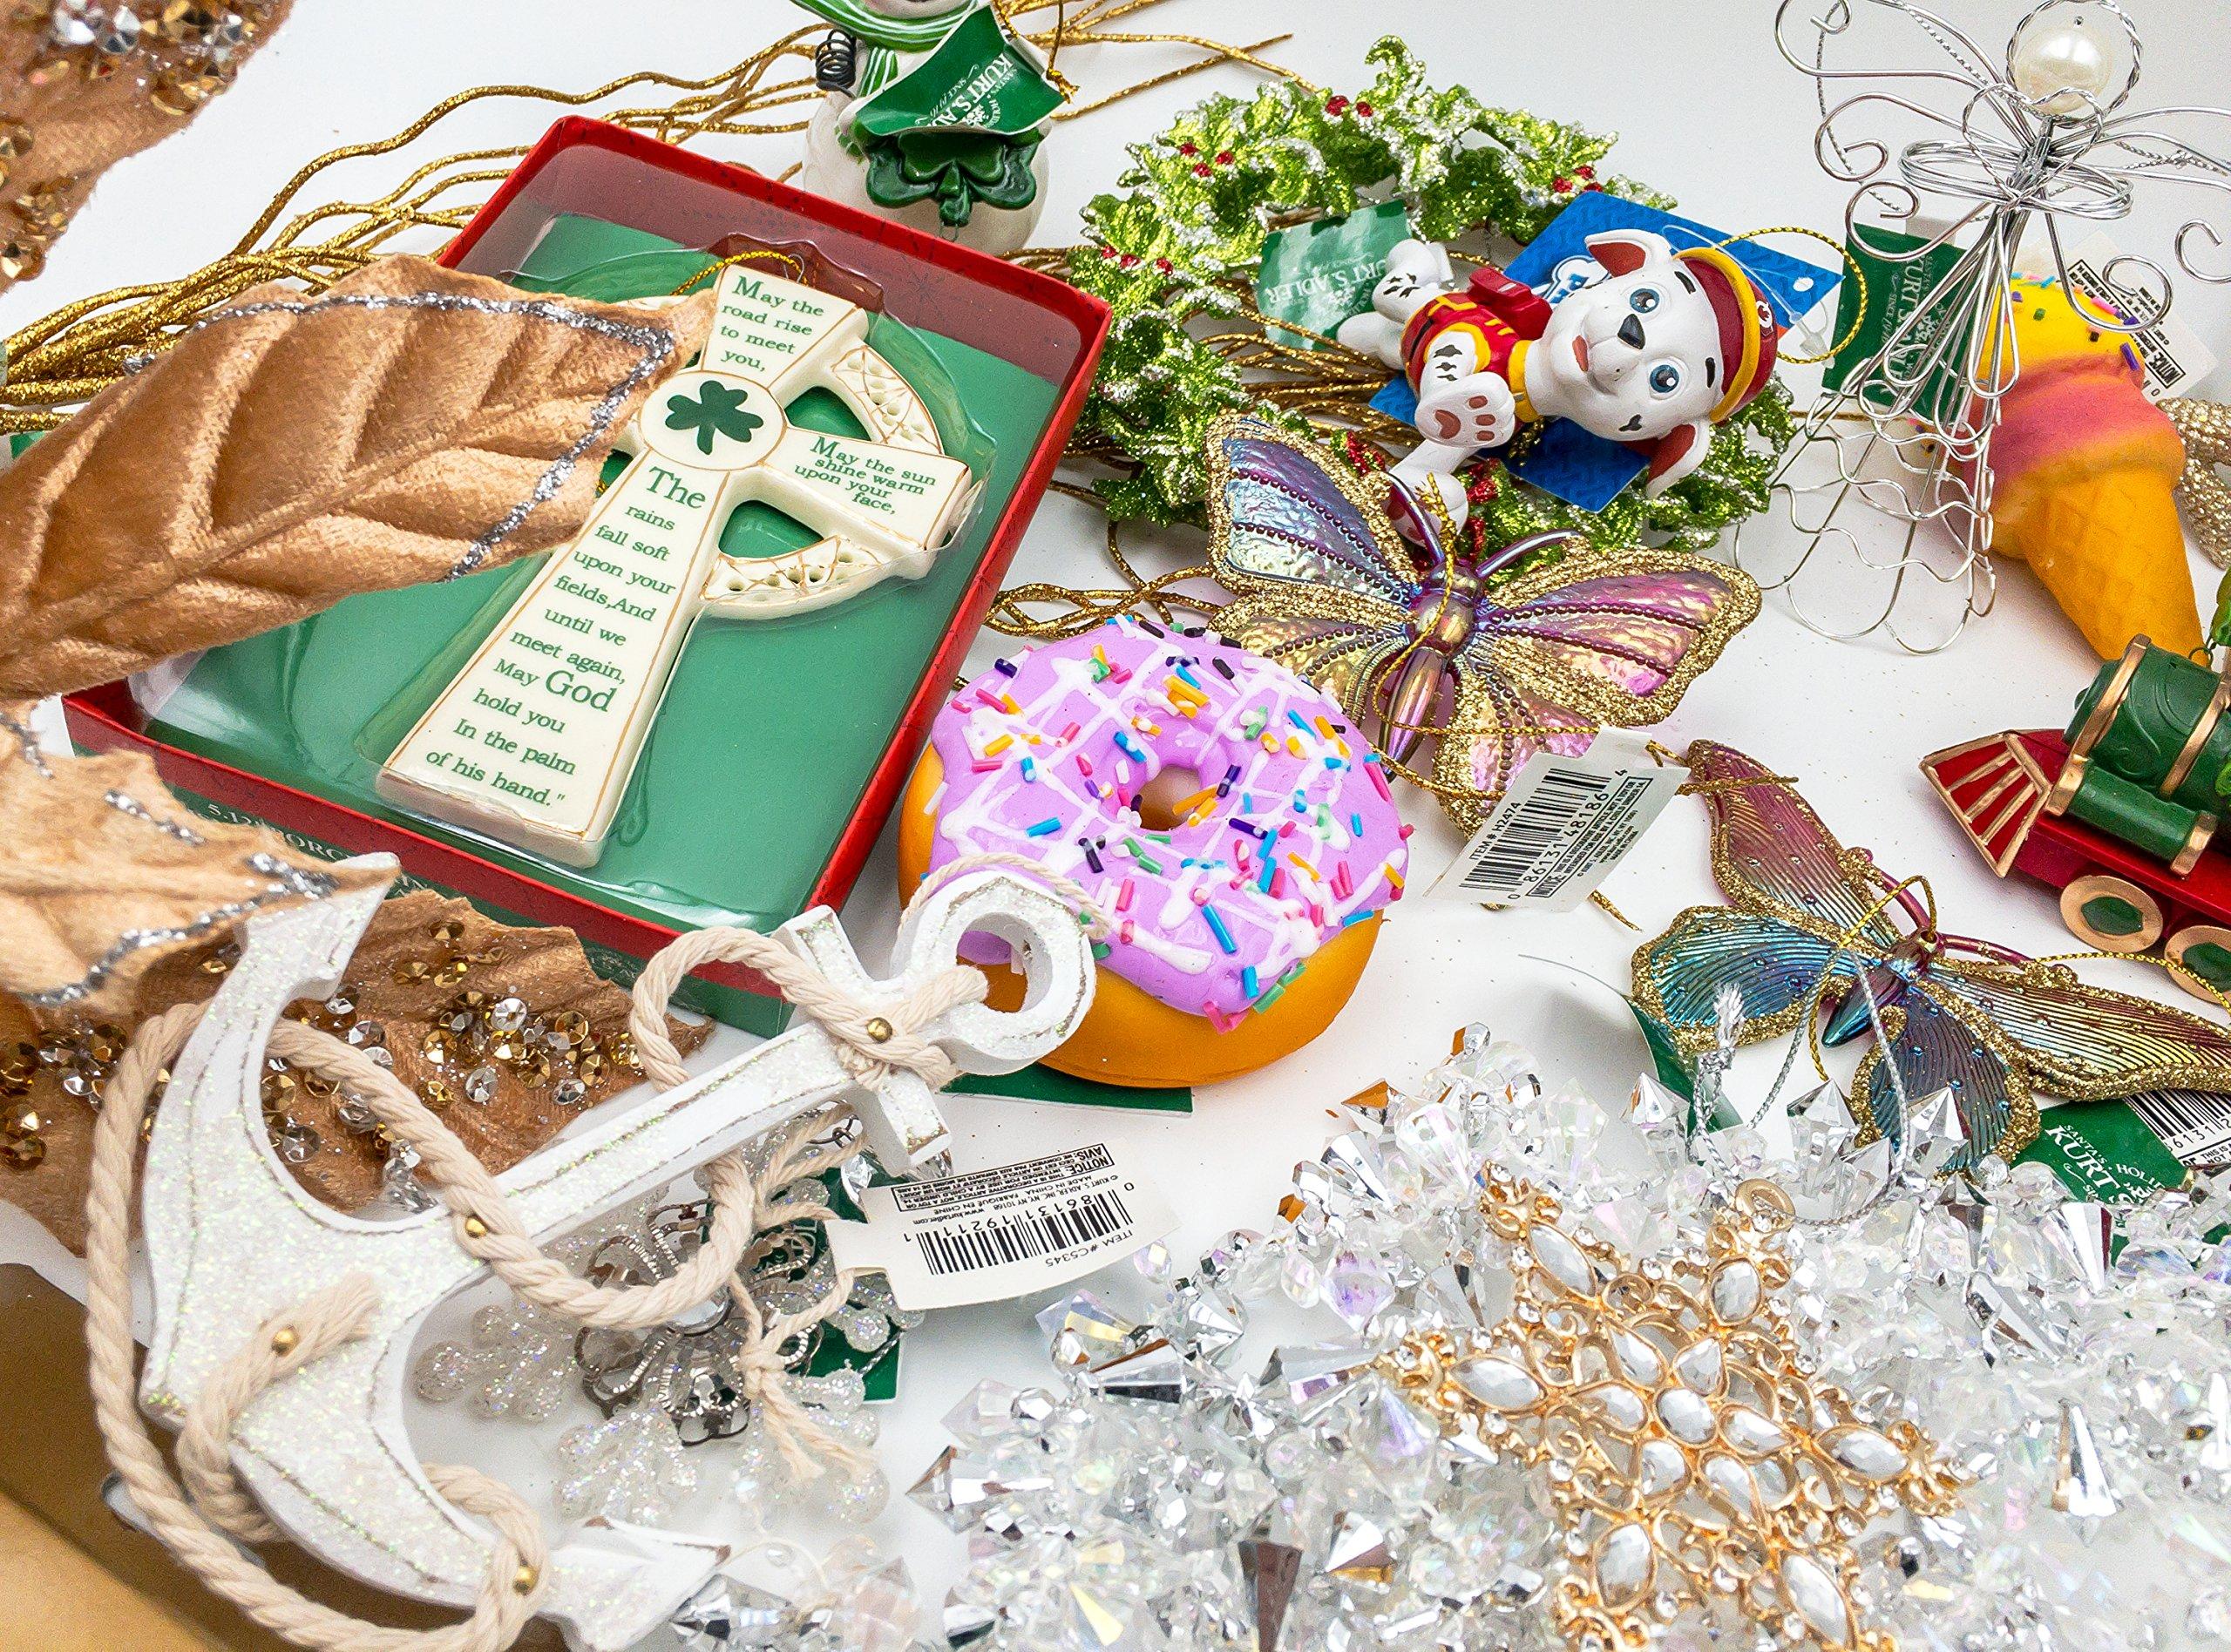 JZ Bundles Starter Set - Best of Christmas Option C - Kurt Adler - 37-Piece Bundle - A Bundle of Christmas Ornaments Great Gift by JZ Bundles (Image #4)